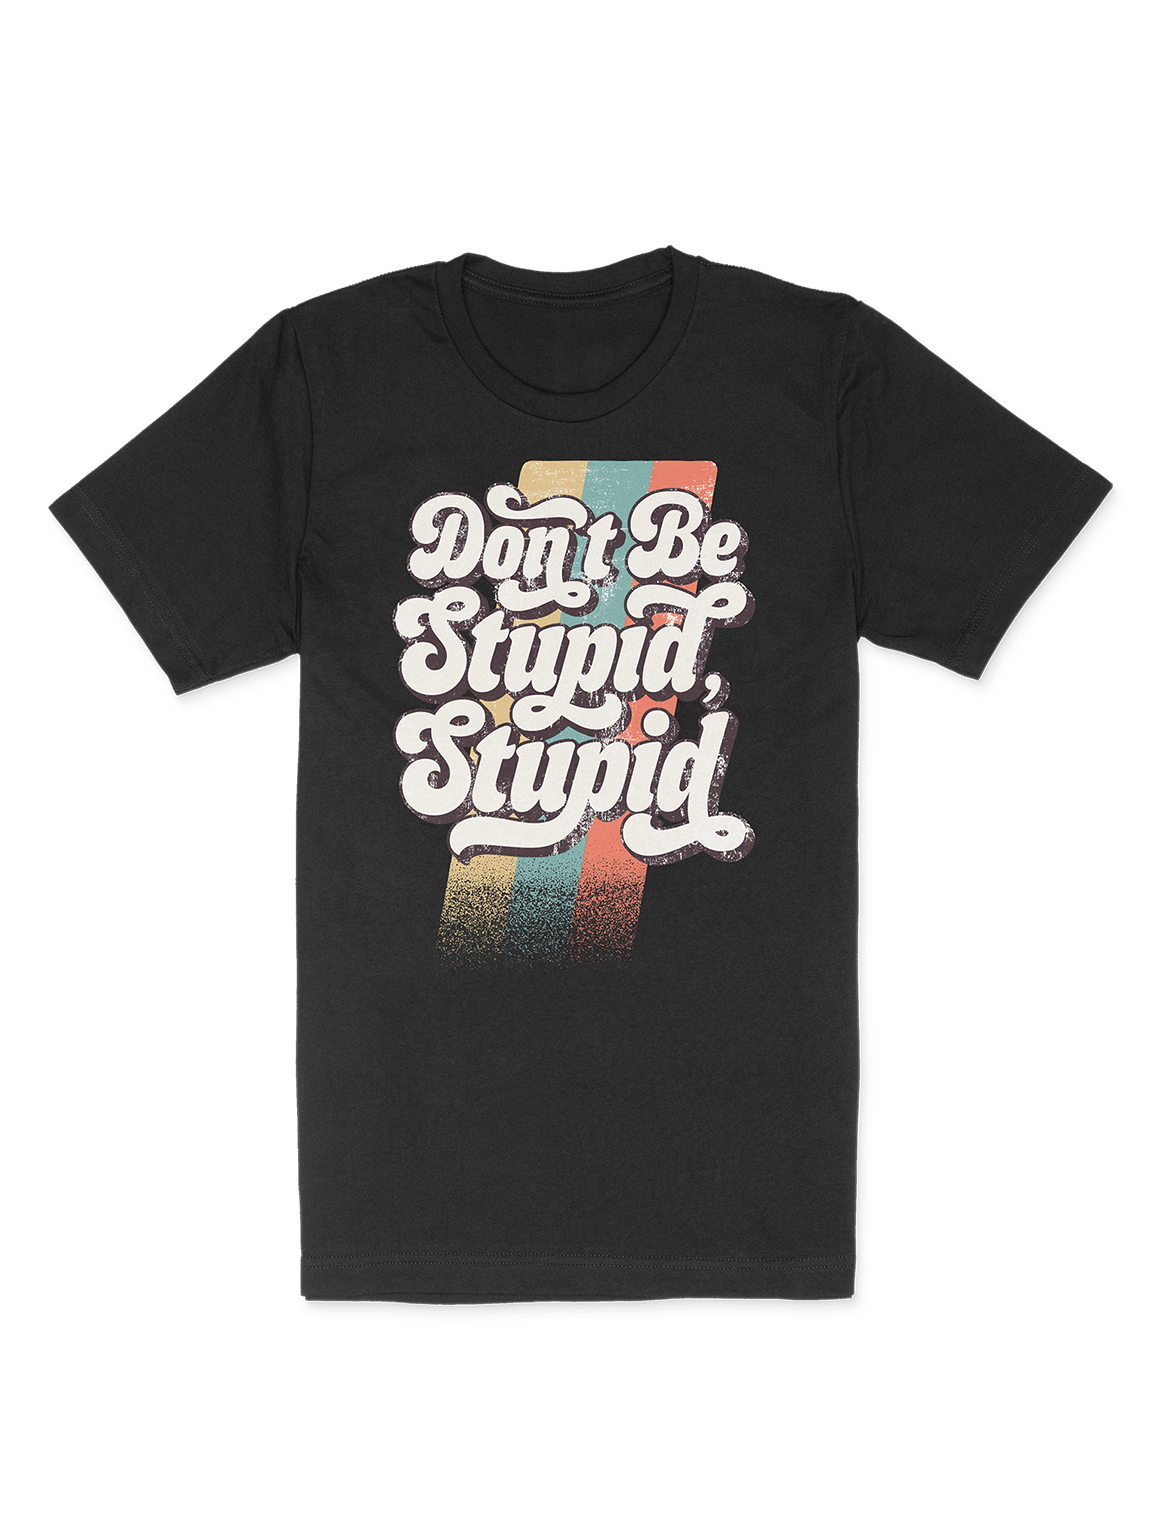 DON'T BE STUPID, STUPID BLACK VINTAGE T-SHIRT product image (1)